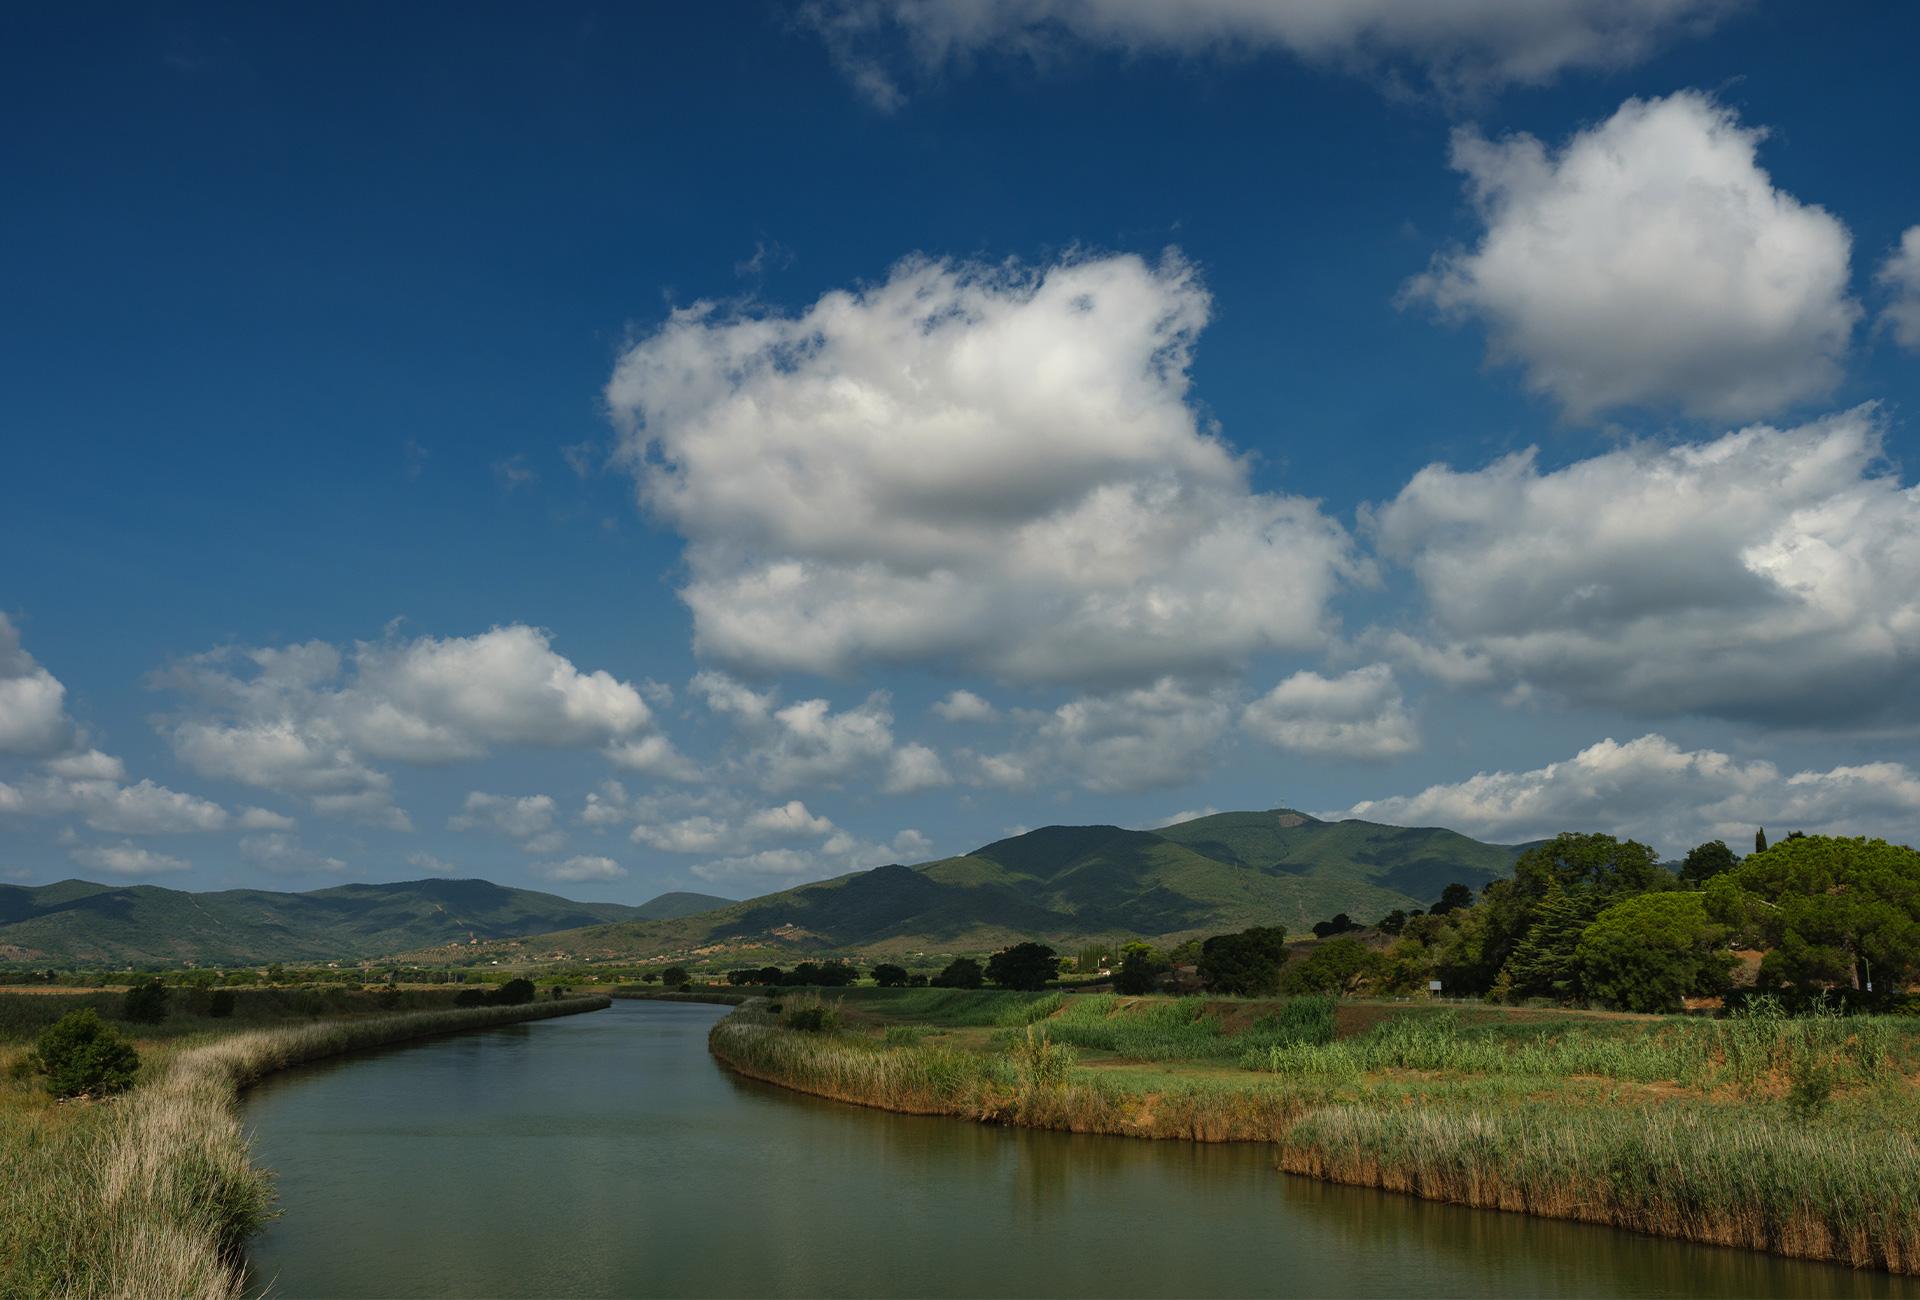 Diaccia Bodrona Nature Reserve